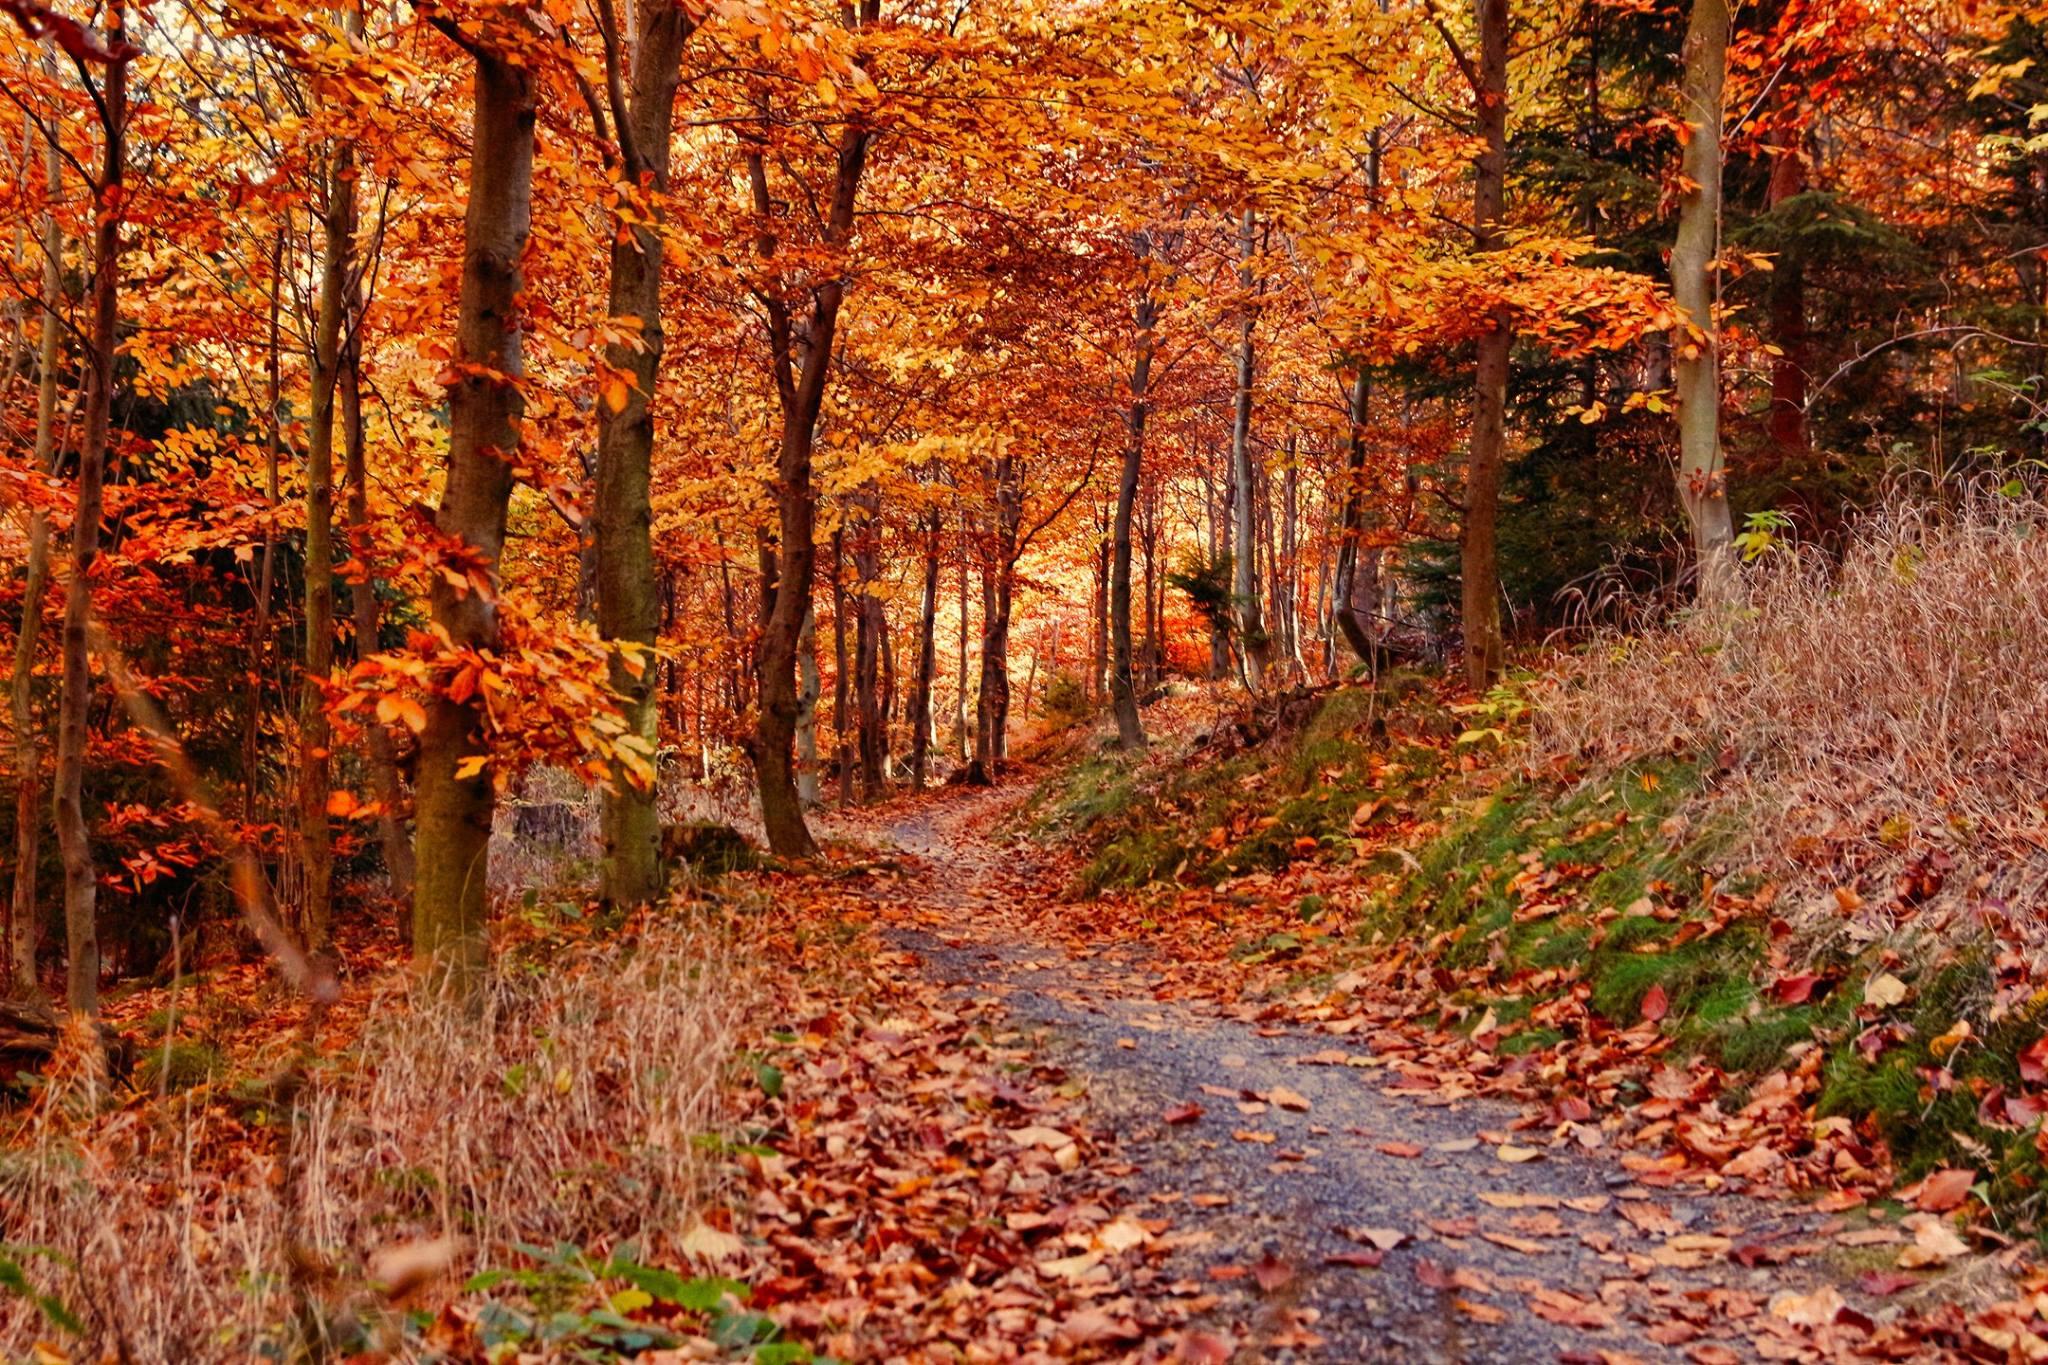 Podzim na Singltreku (foto: Tomáš Houzar)